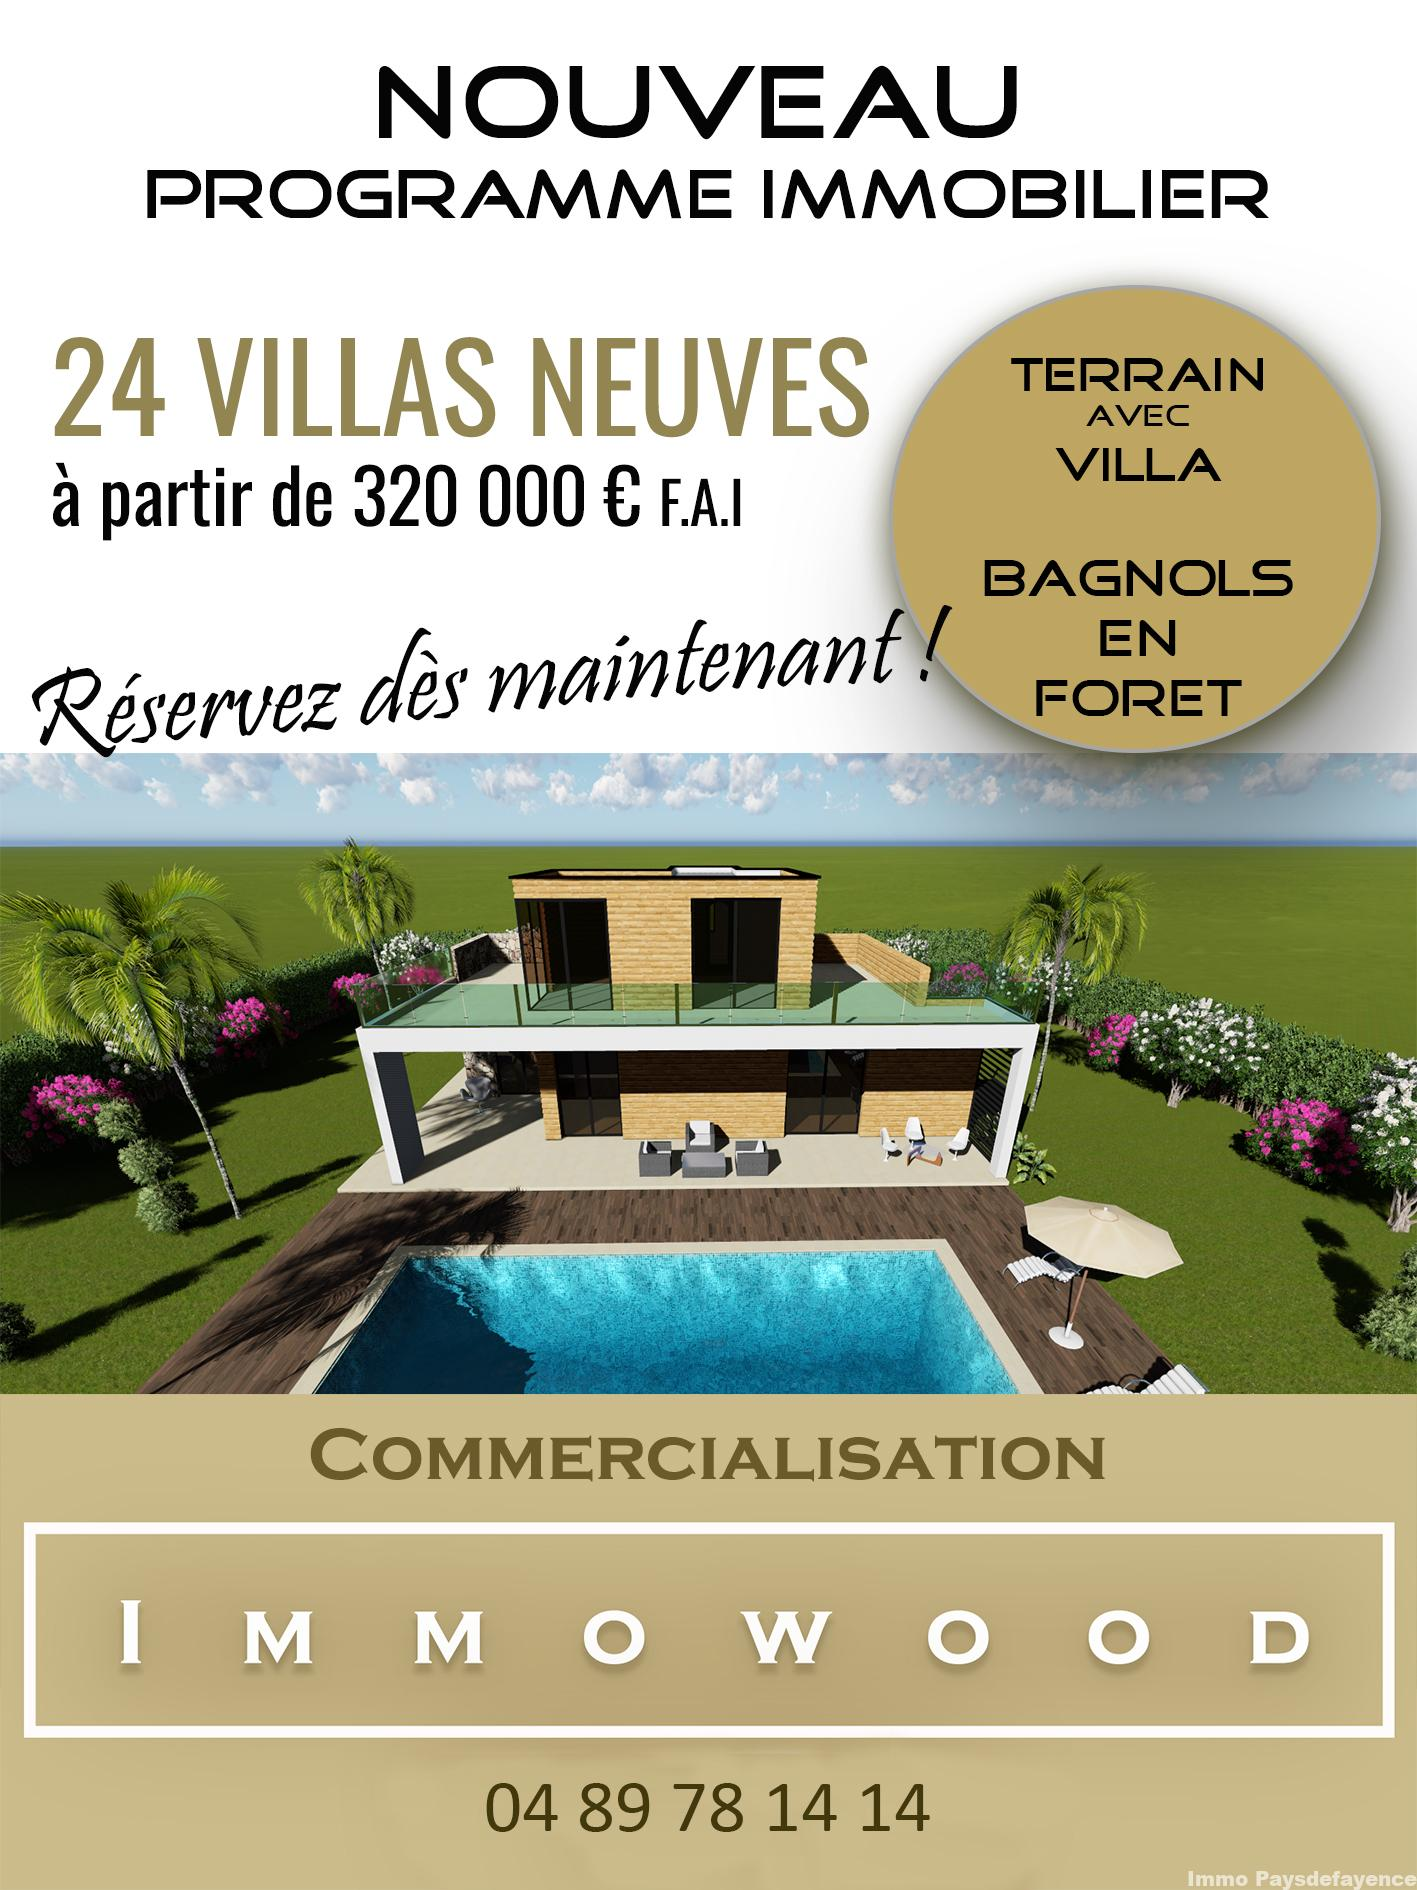 PROGRAMME NEUF BAGNOLS EN FORET- 24 VILLAS JARDIN PRIVE à 320000 €